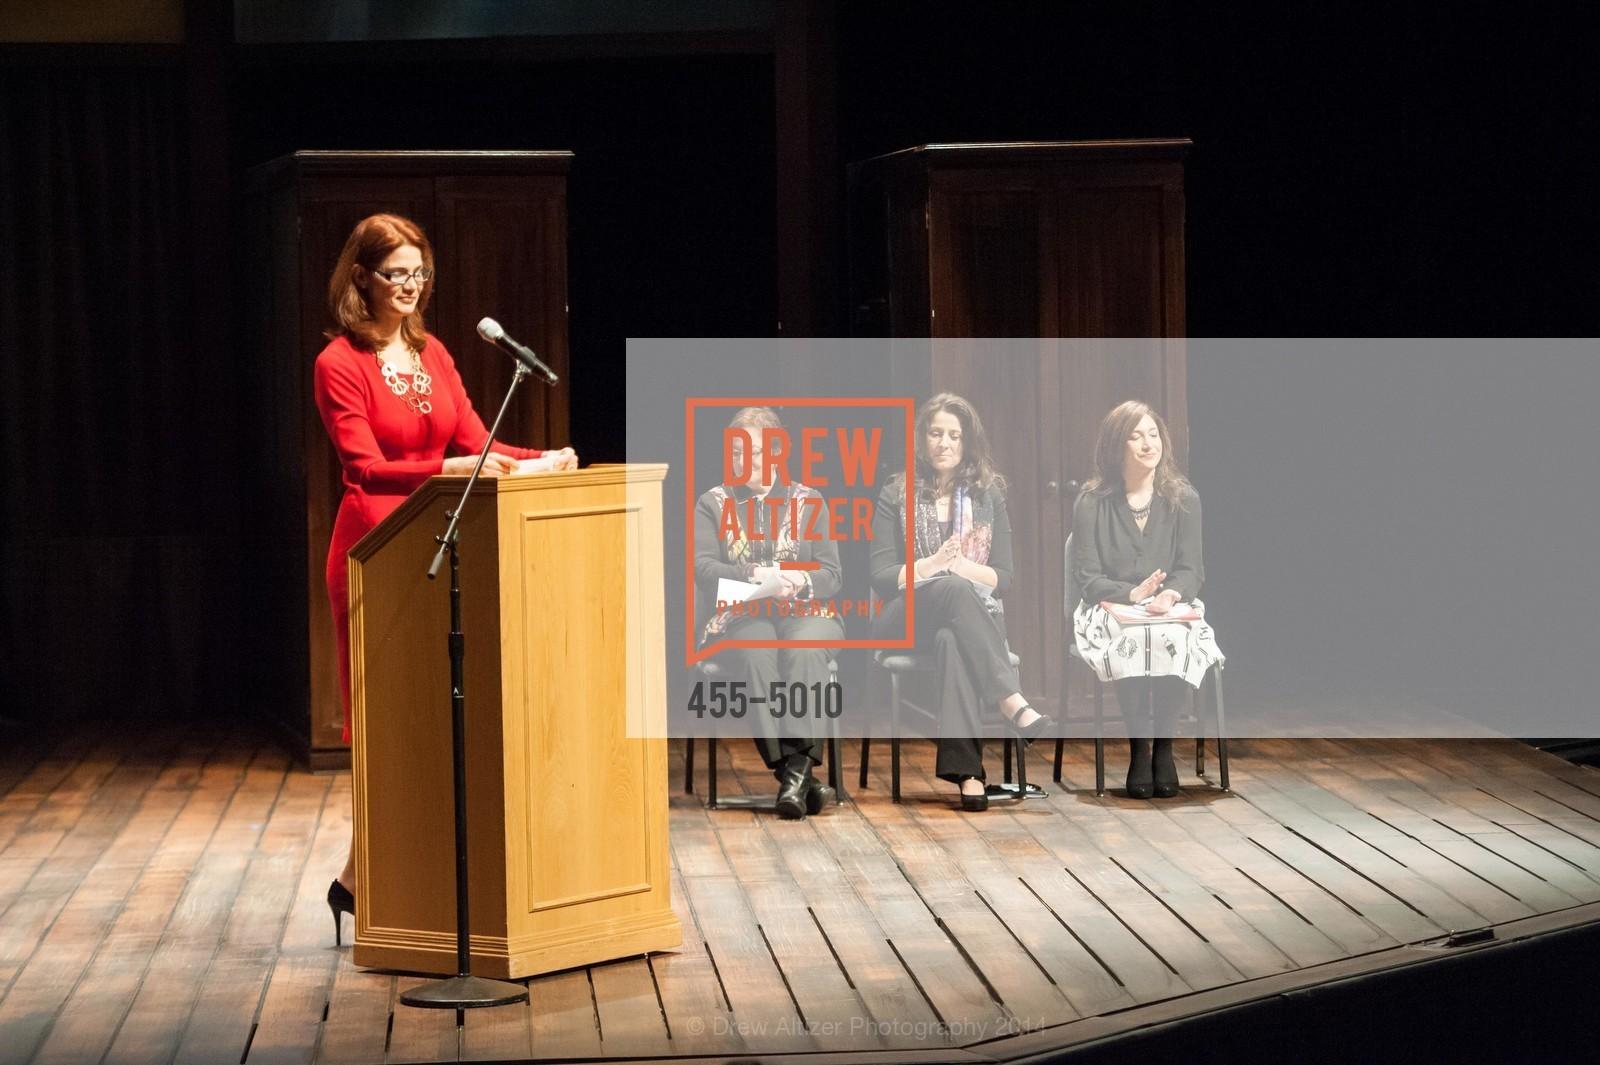 Jenny Dearborn, Ann Bowers, Natalie Batalha, Randi Zuckerberg, Photo #455-5010